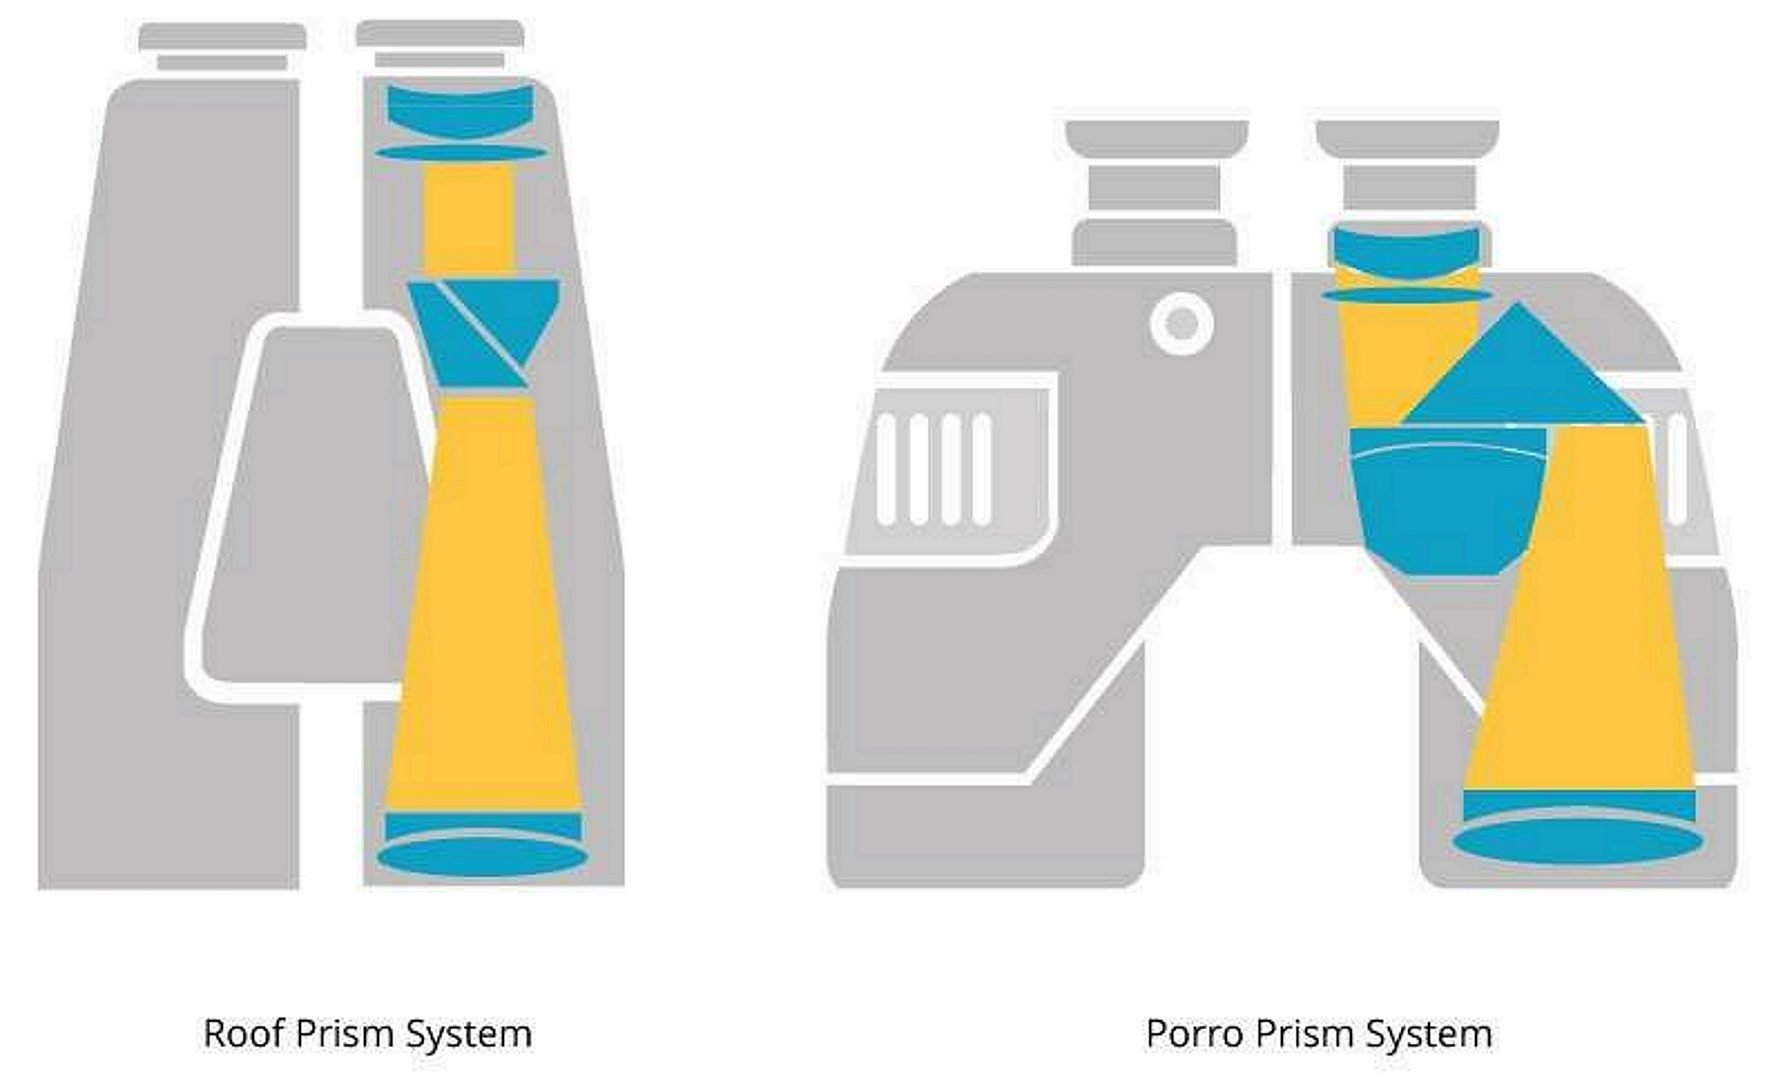 Roof and Porro Prism Binocular Infographics